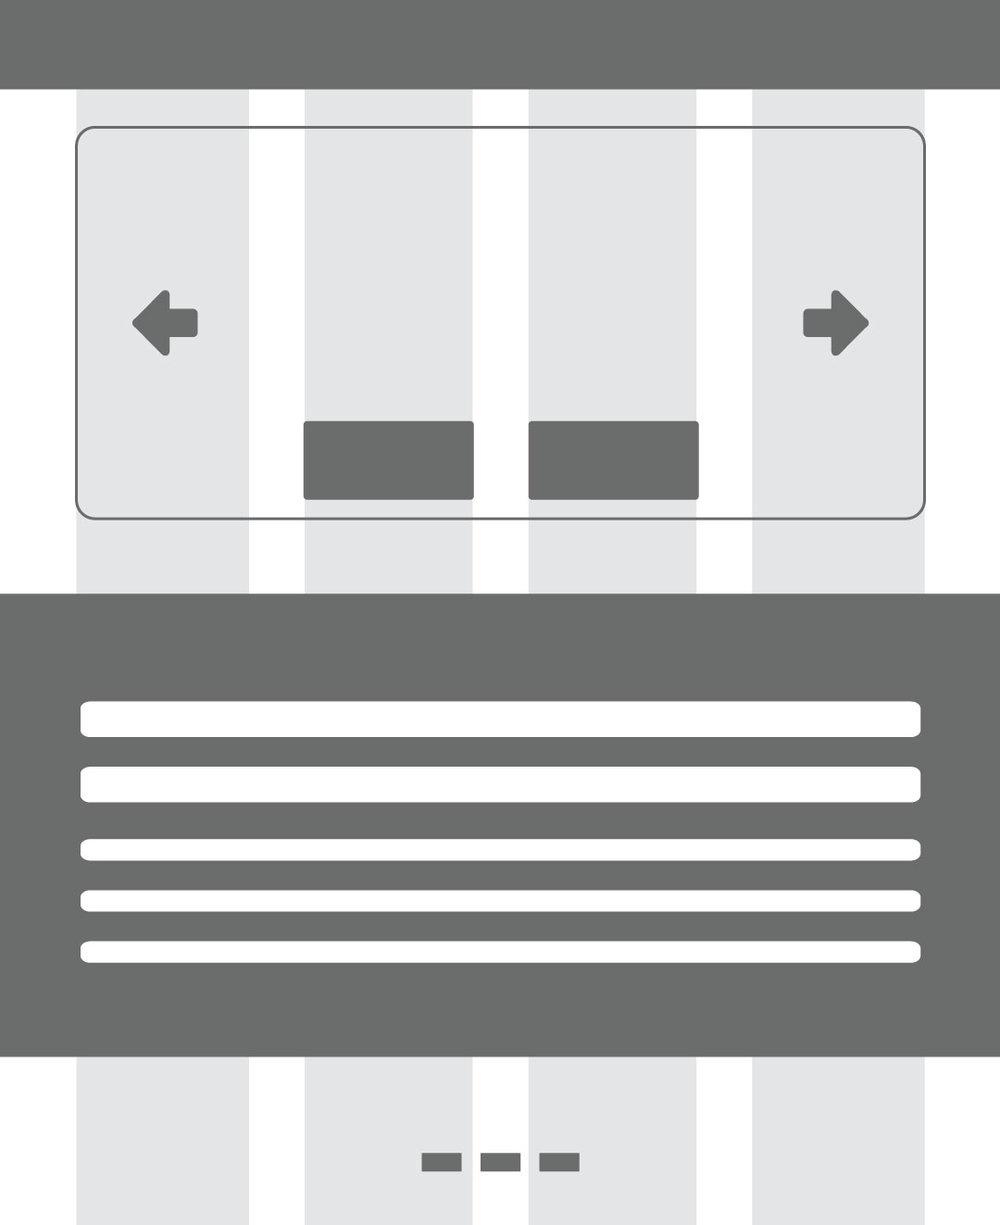 Wireframe Option 1